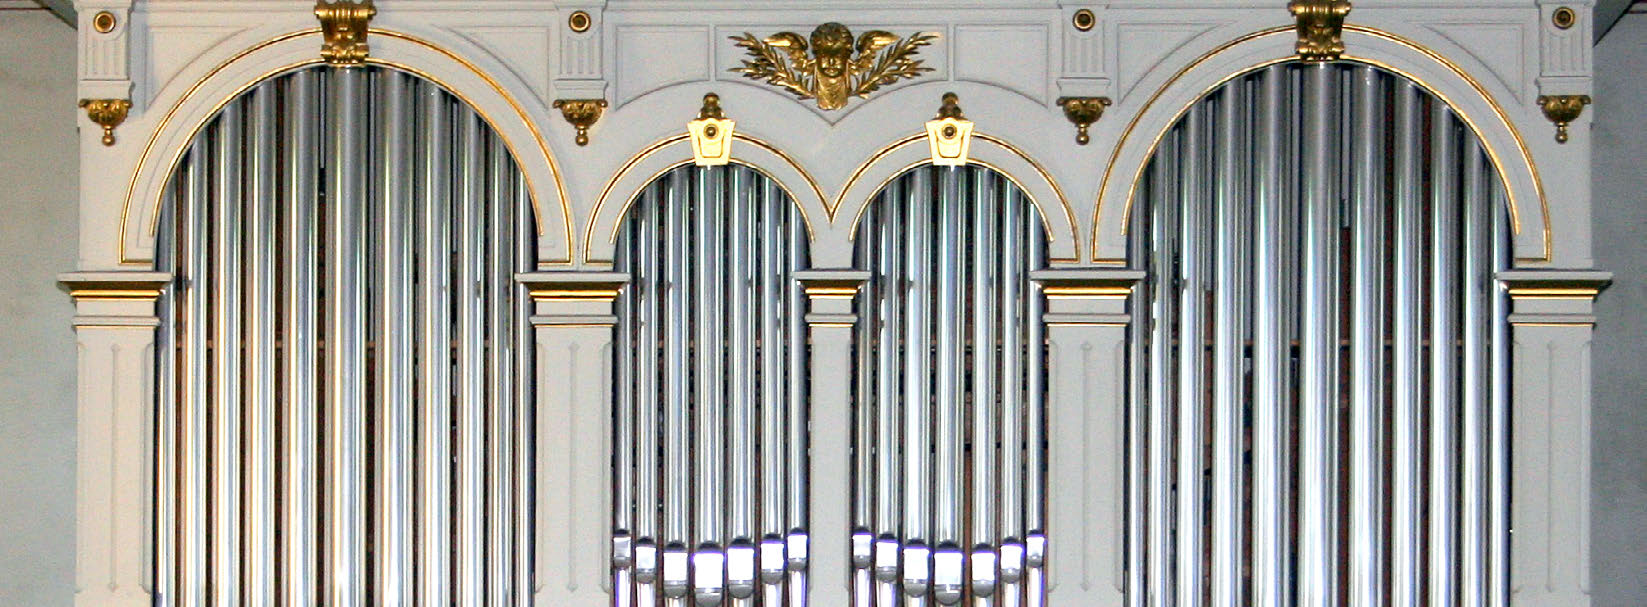 orgel_prospekt